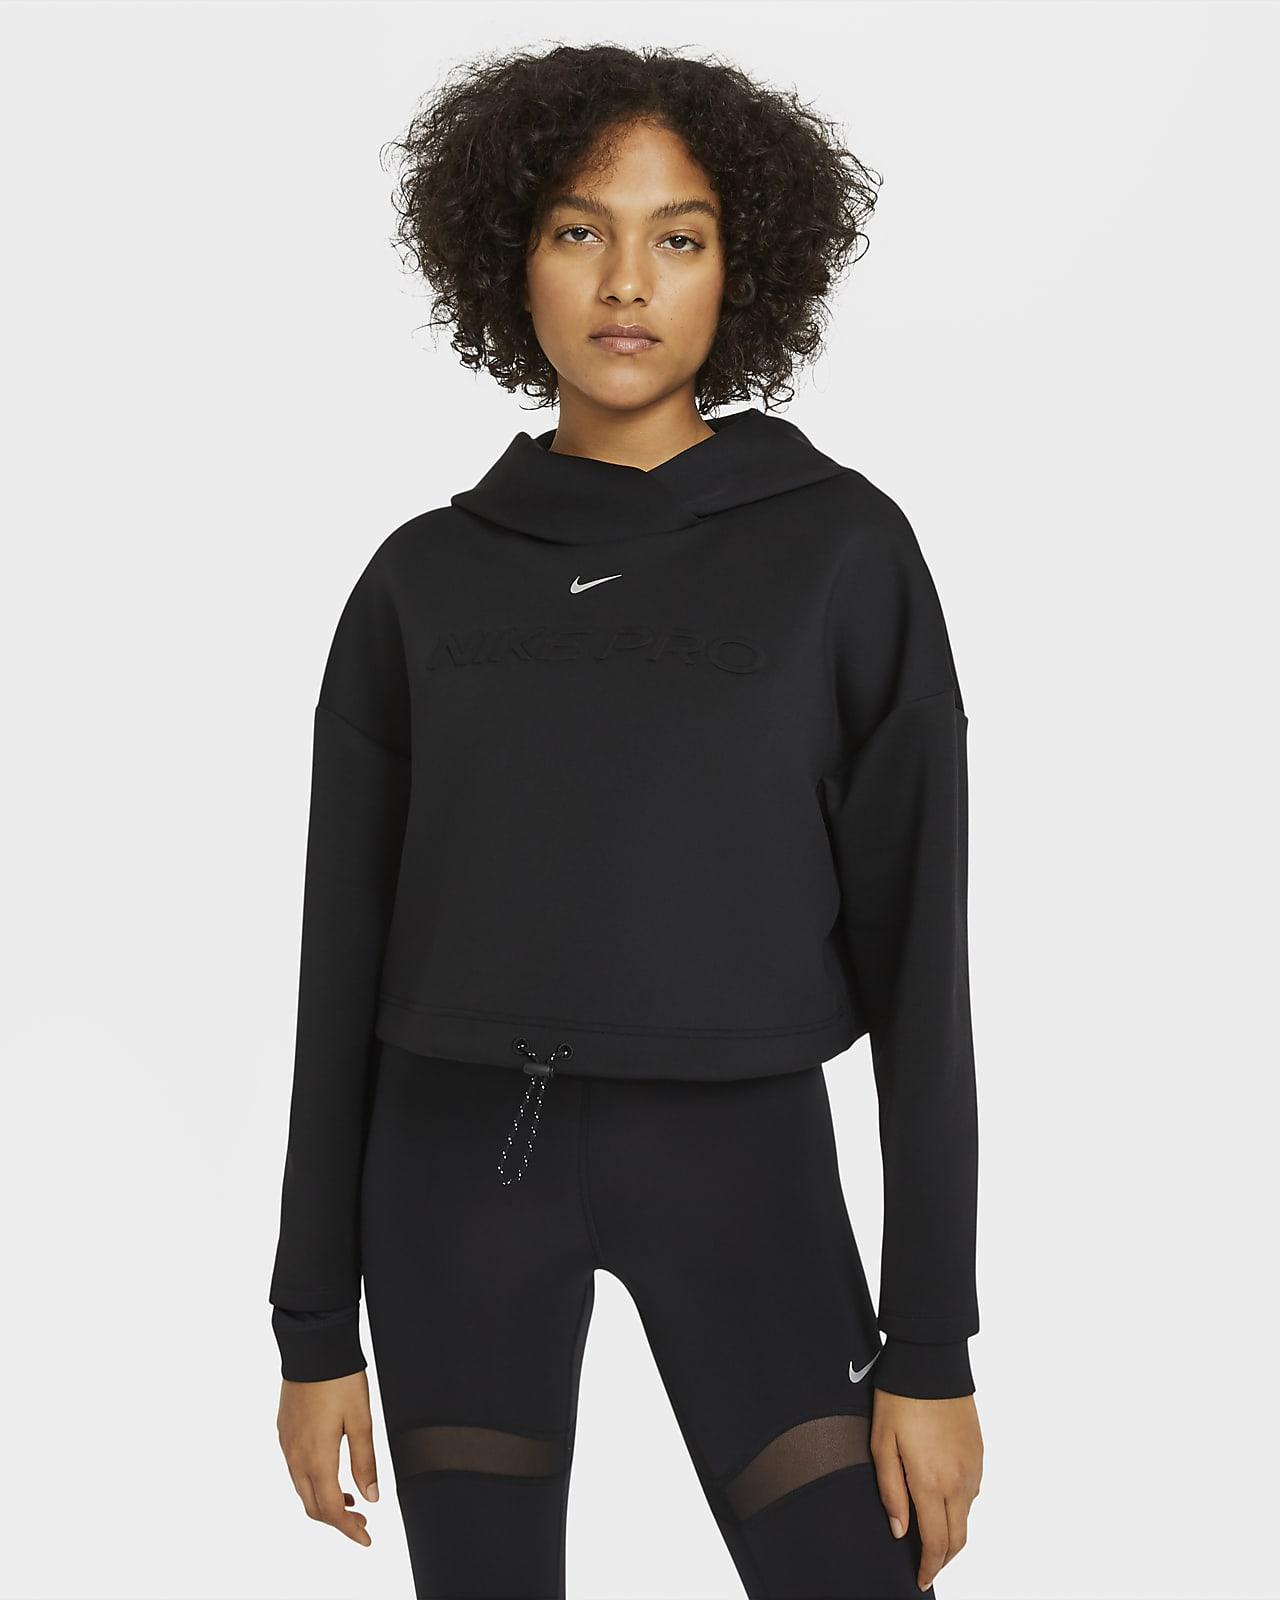 Nike Pro Dessuadora amb caputxa - Dona